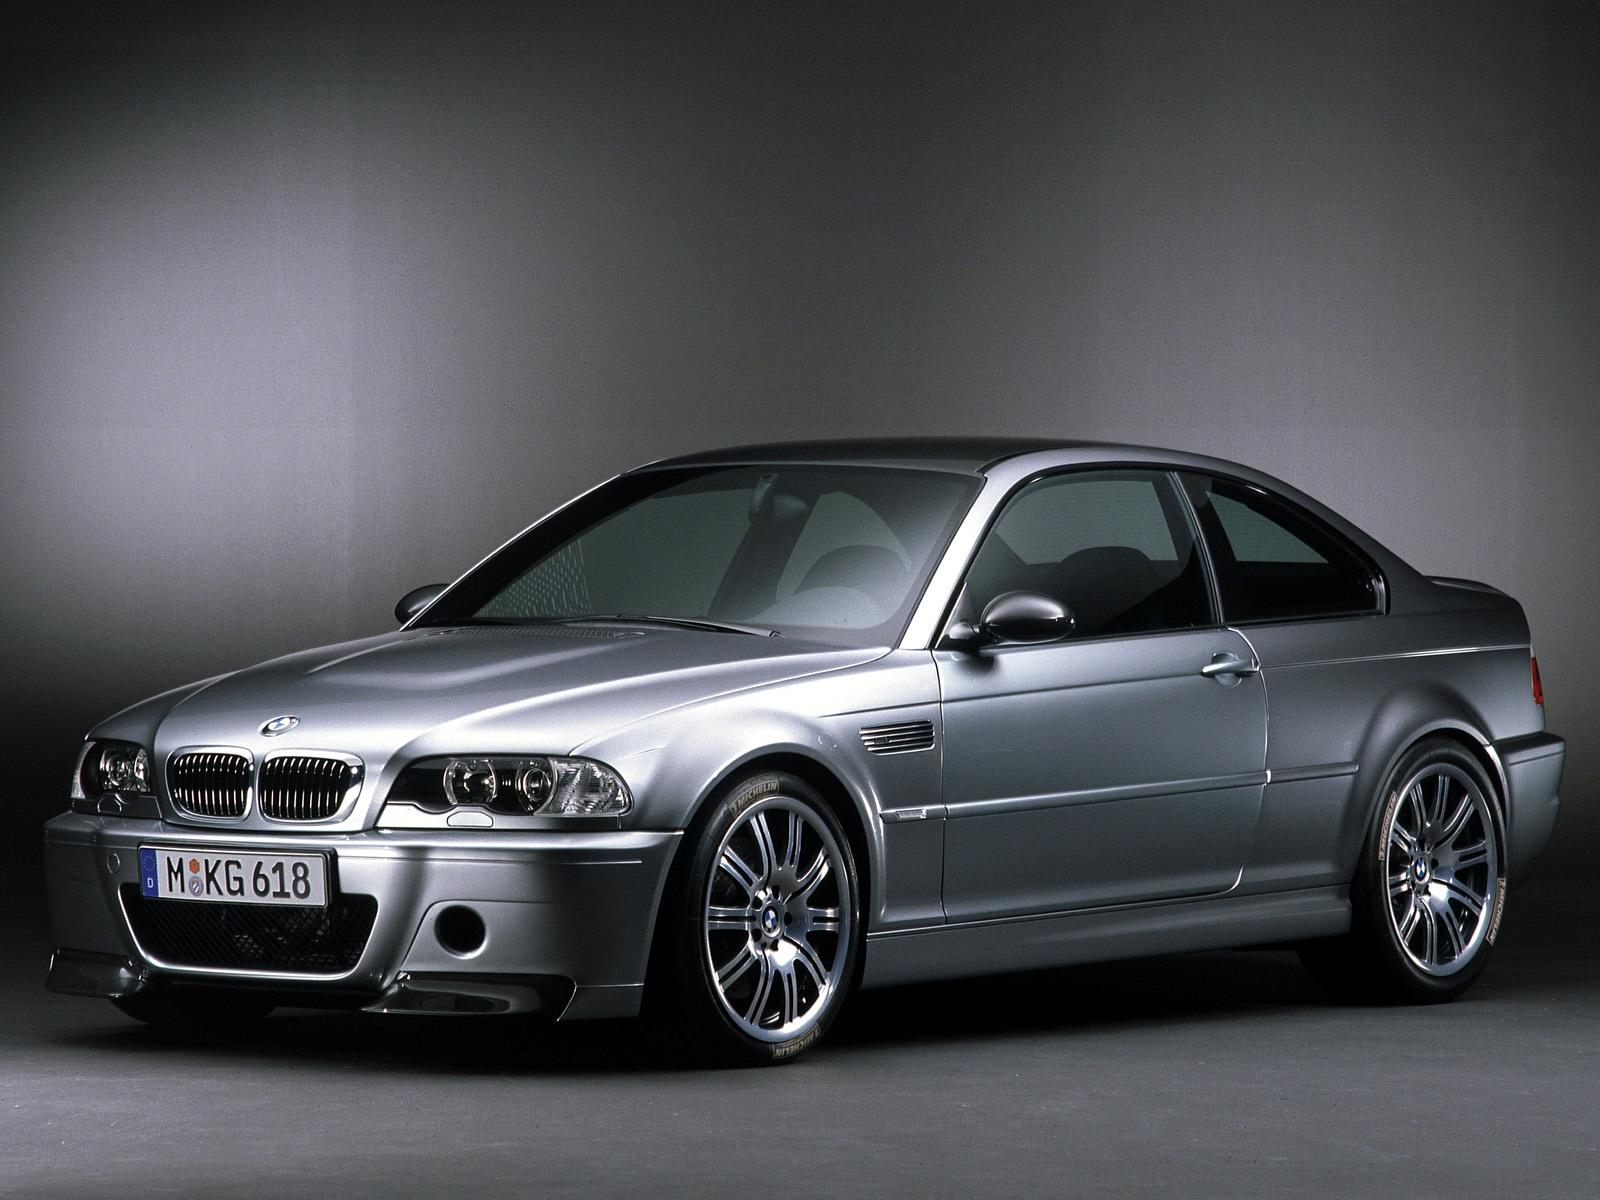 BMW M3 E46 WallpapersBmw m3 wallpaper Bmw m3 wallpaper 1600x1200